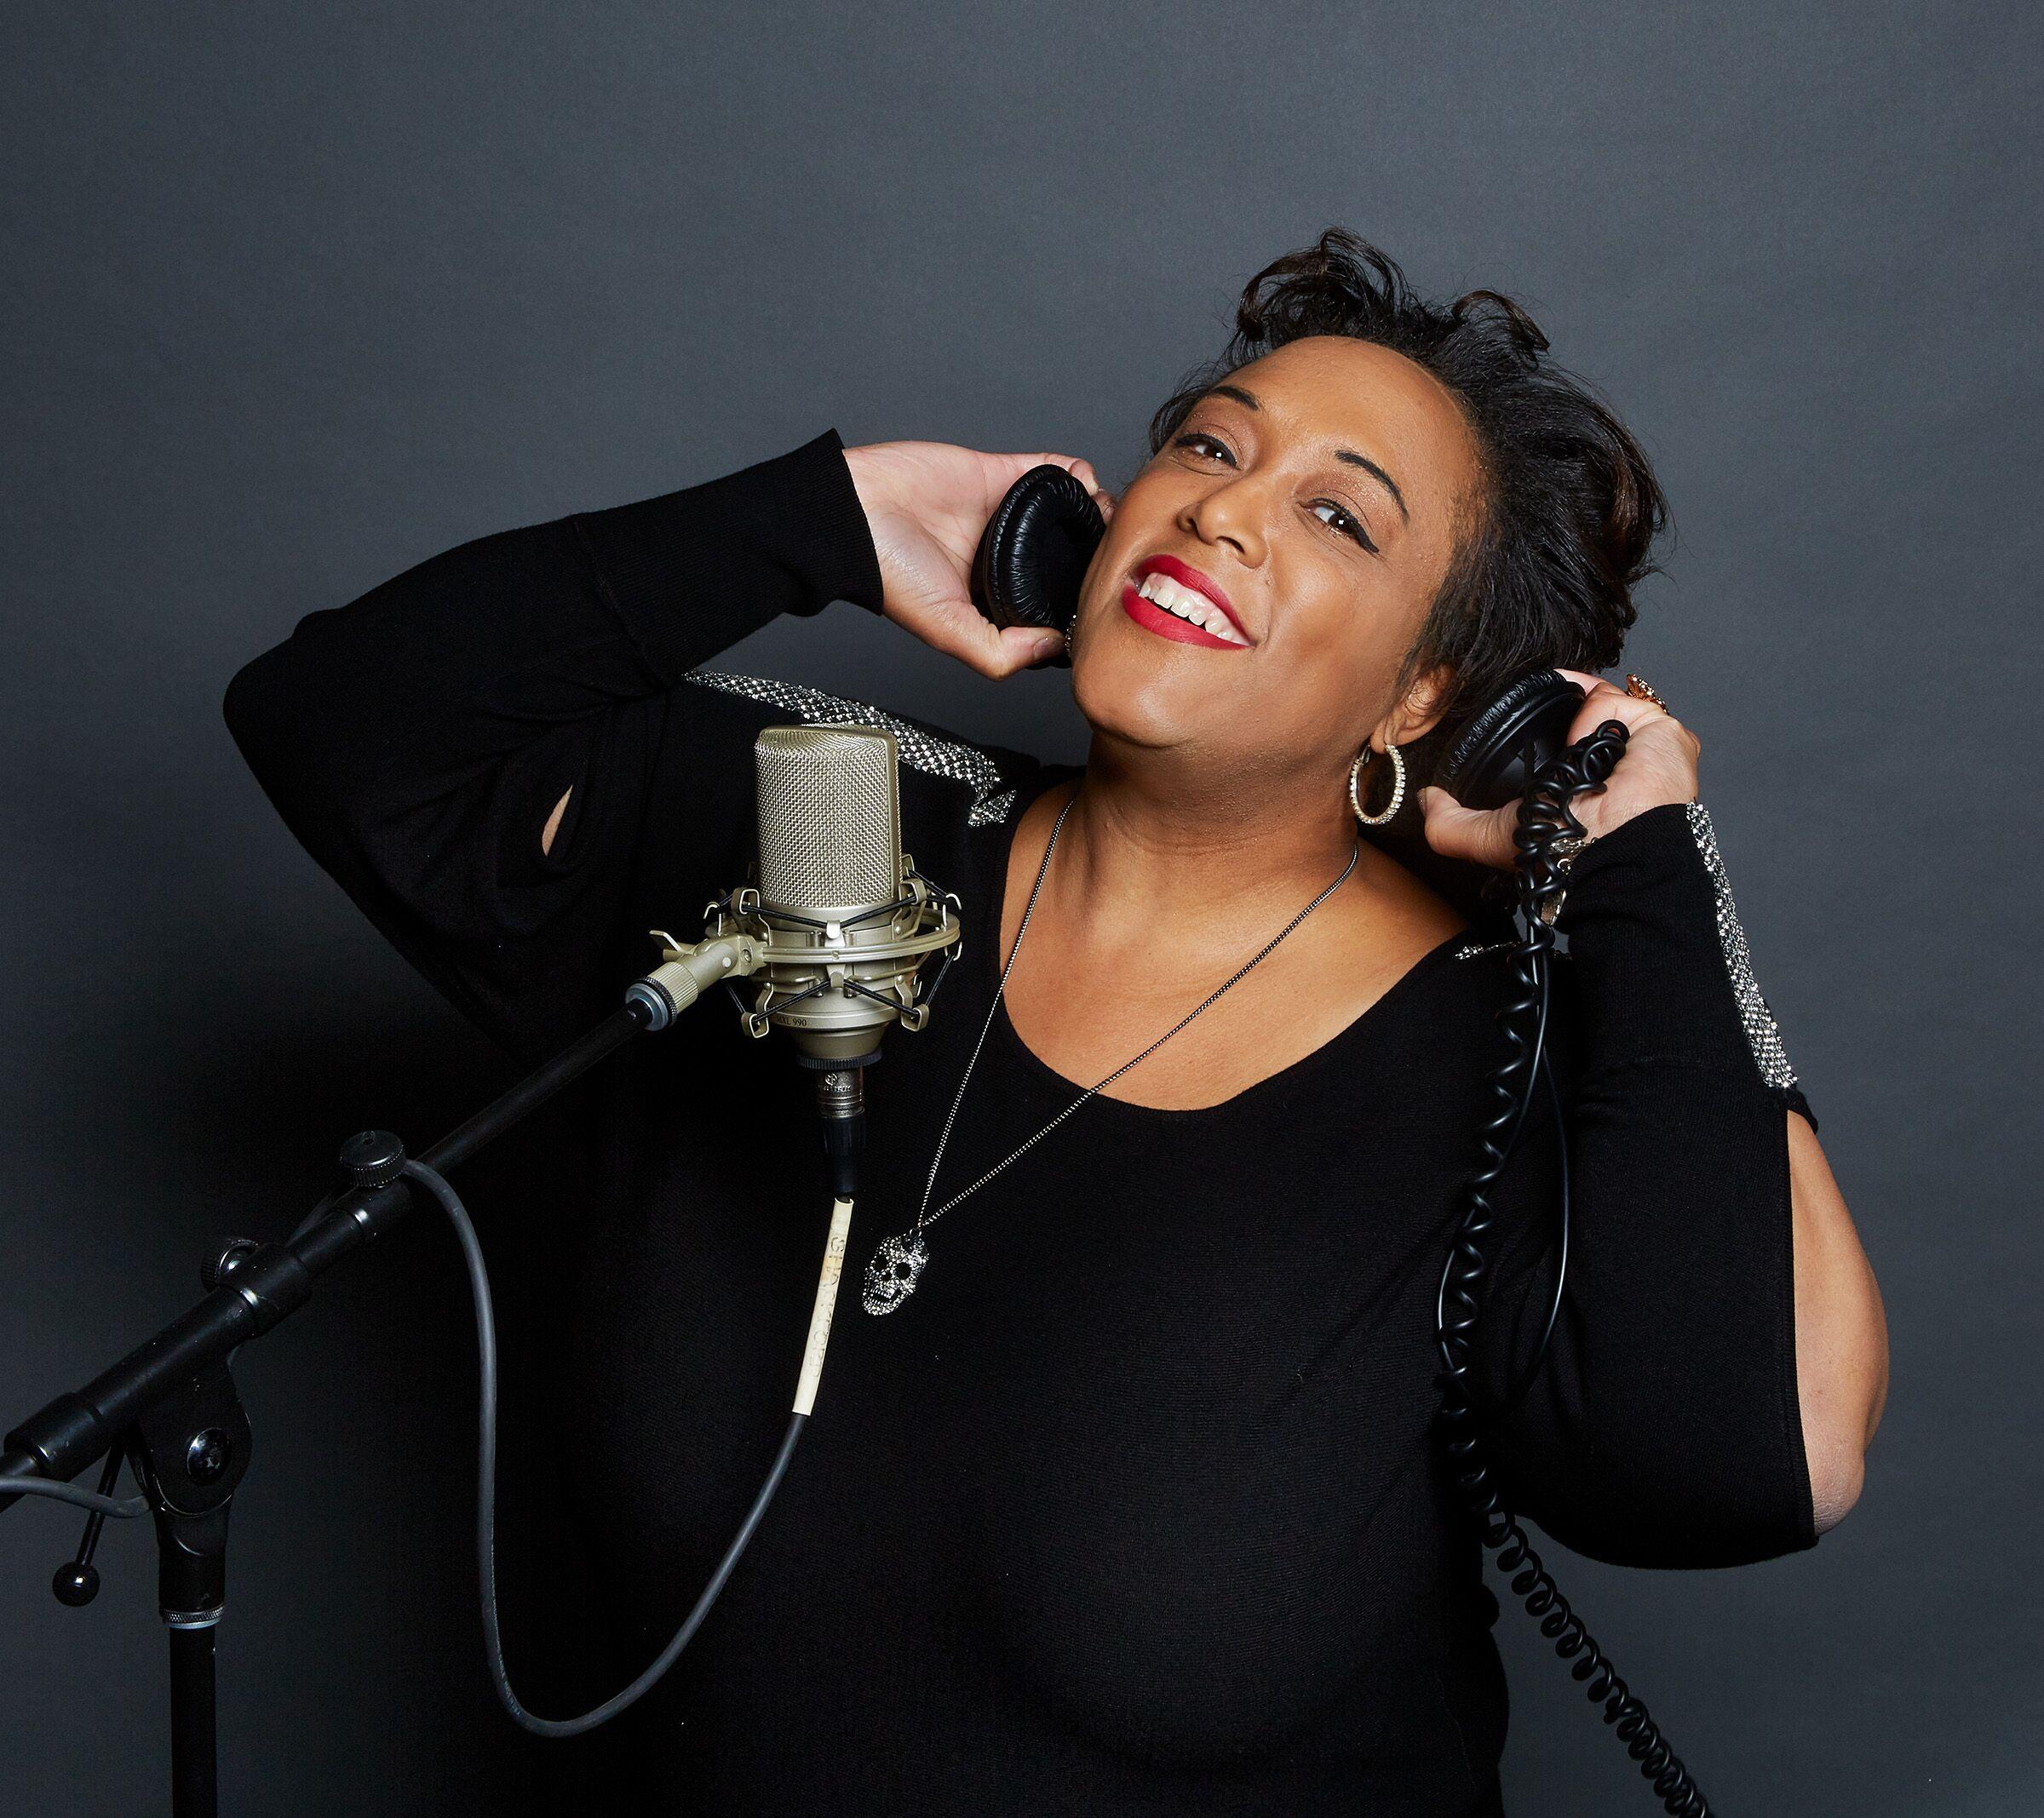 Jazz and more! Distinctive music programming! Listen now - KUVO